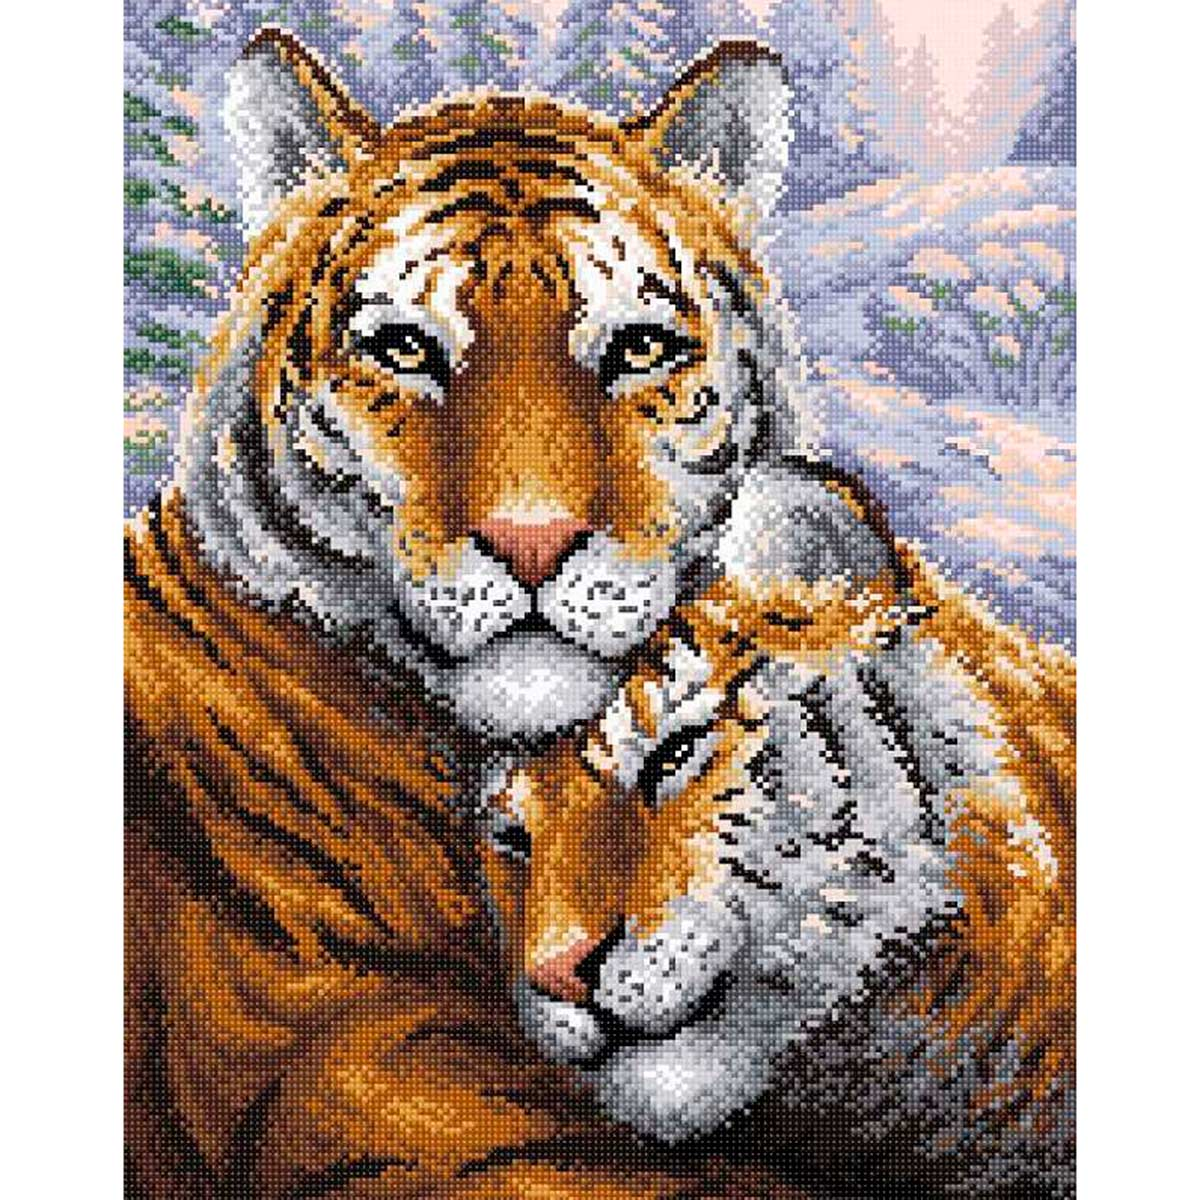 МС 020 Алмазная мозаика 'Тигры'38*48см Brilliart